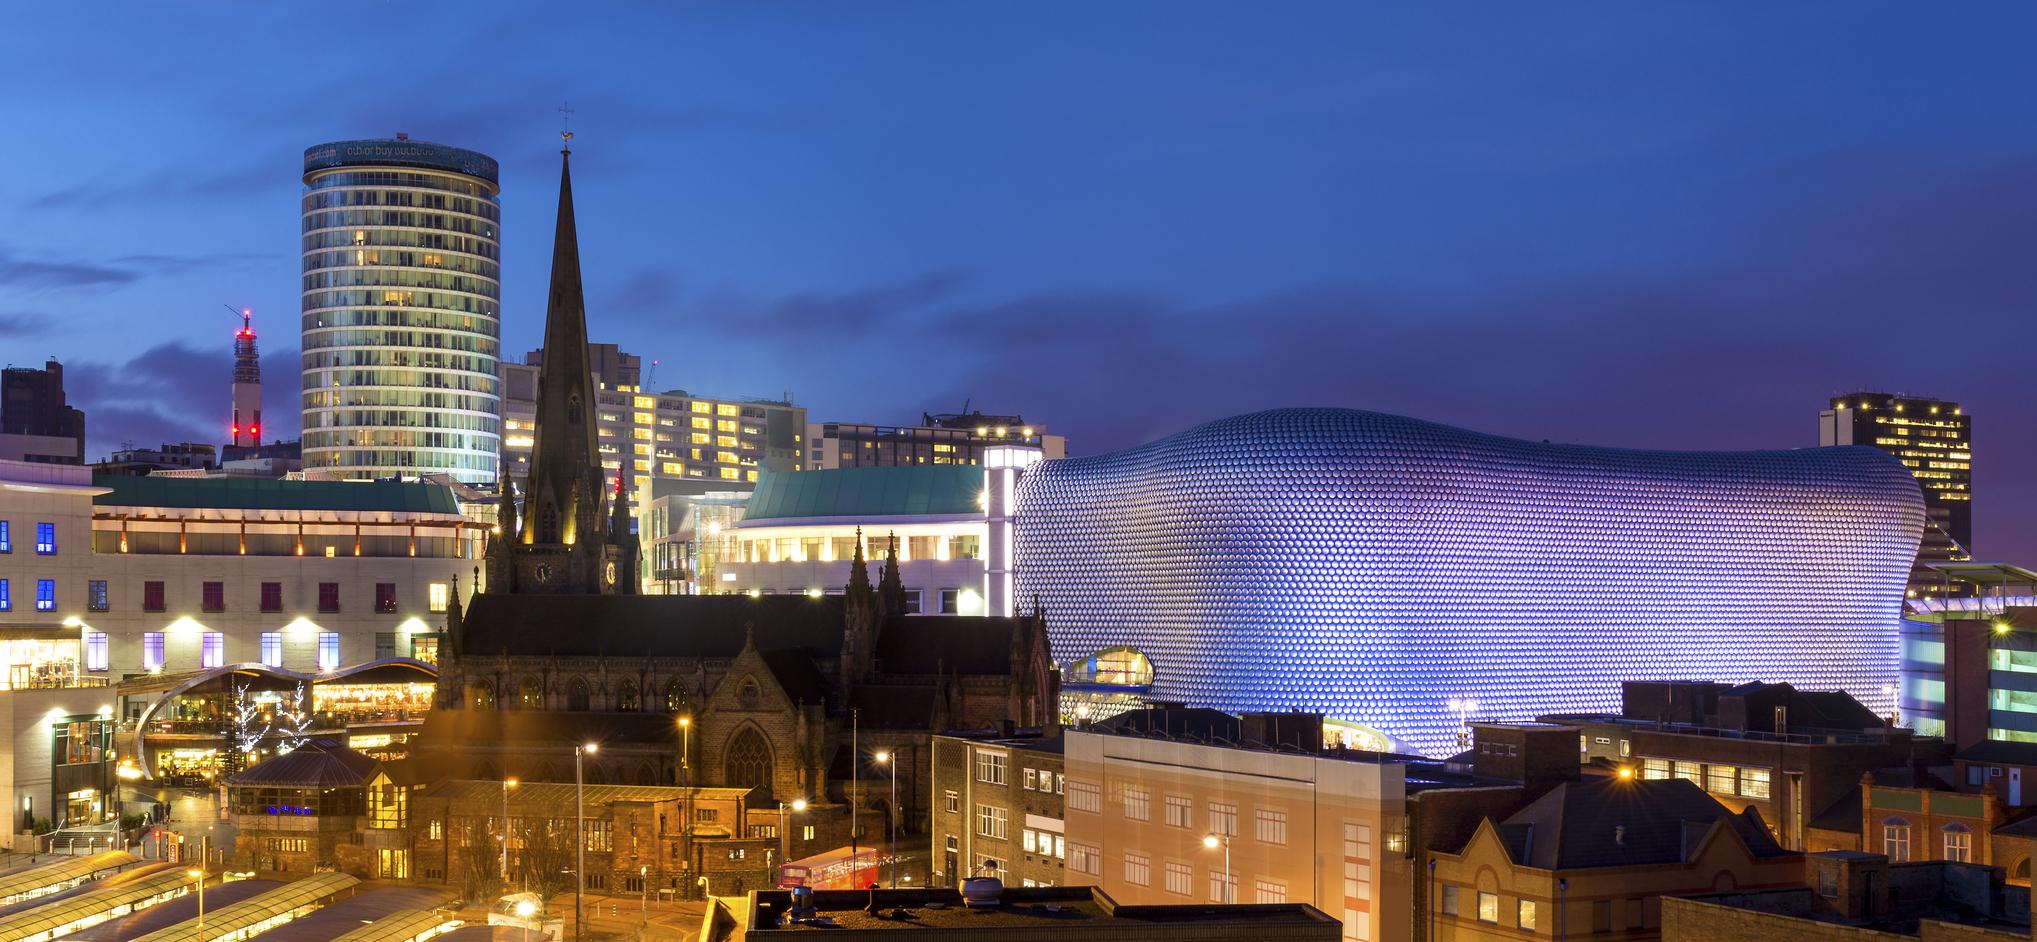 Birmingham Panoramic Cityscape, England, UK